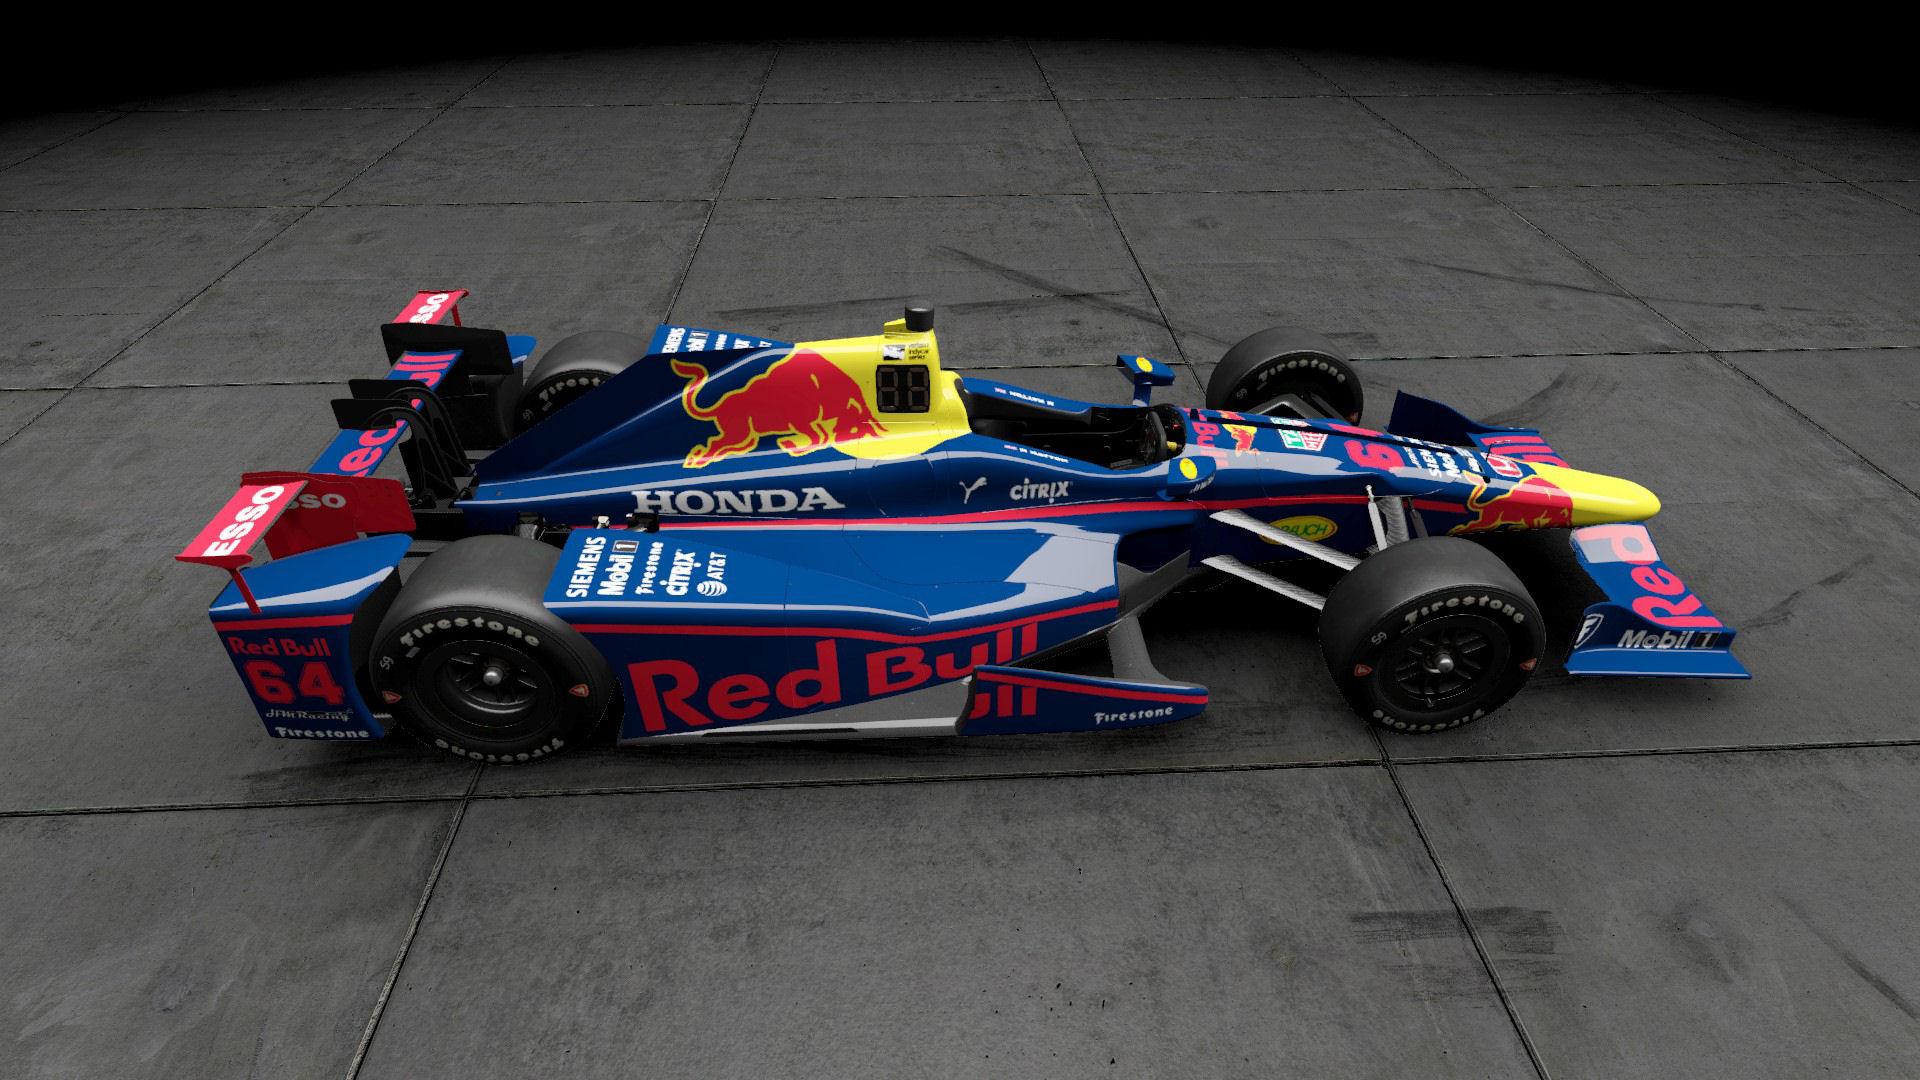 Red Bull dallara dw12 Honda oval 03.jpg